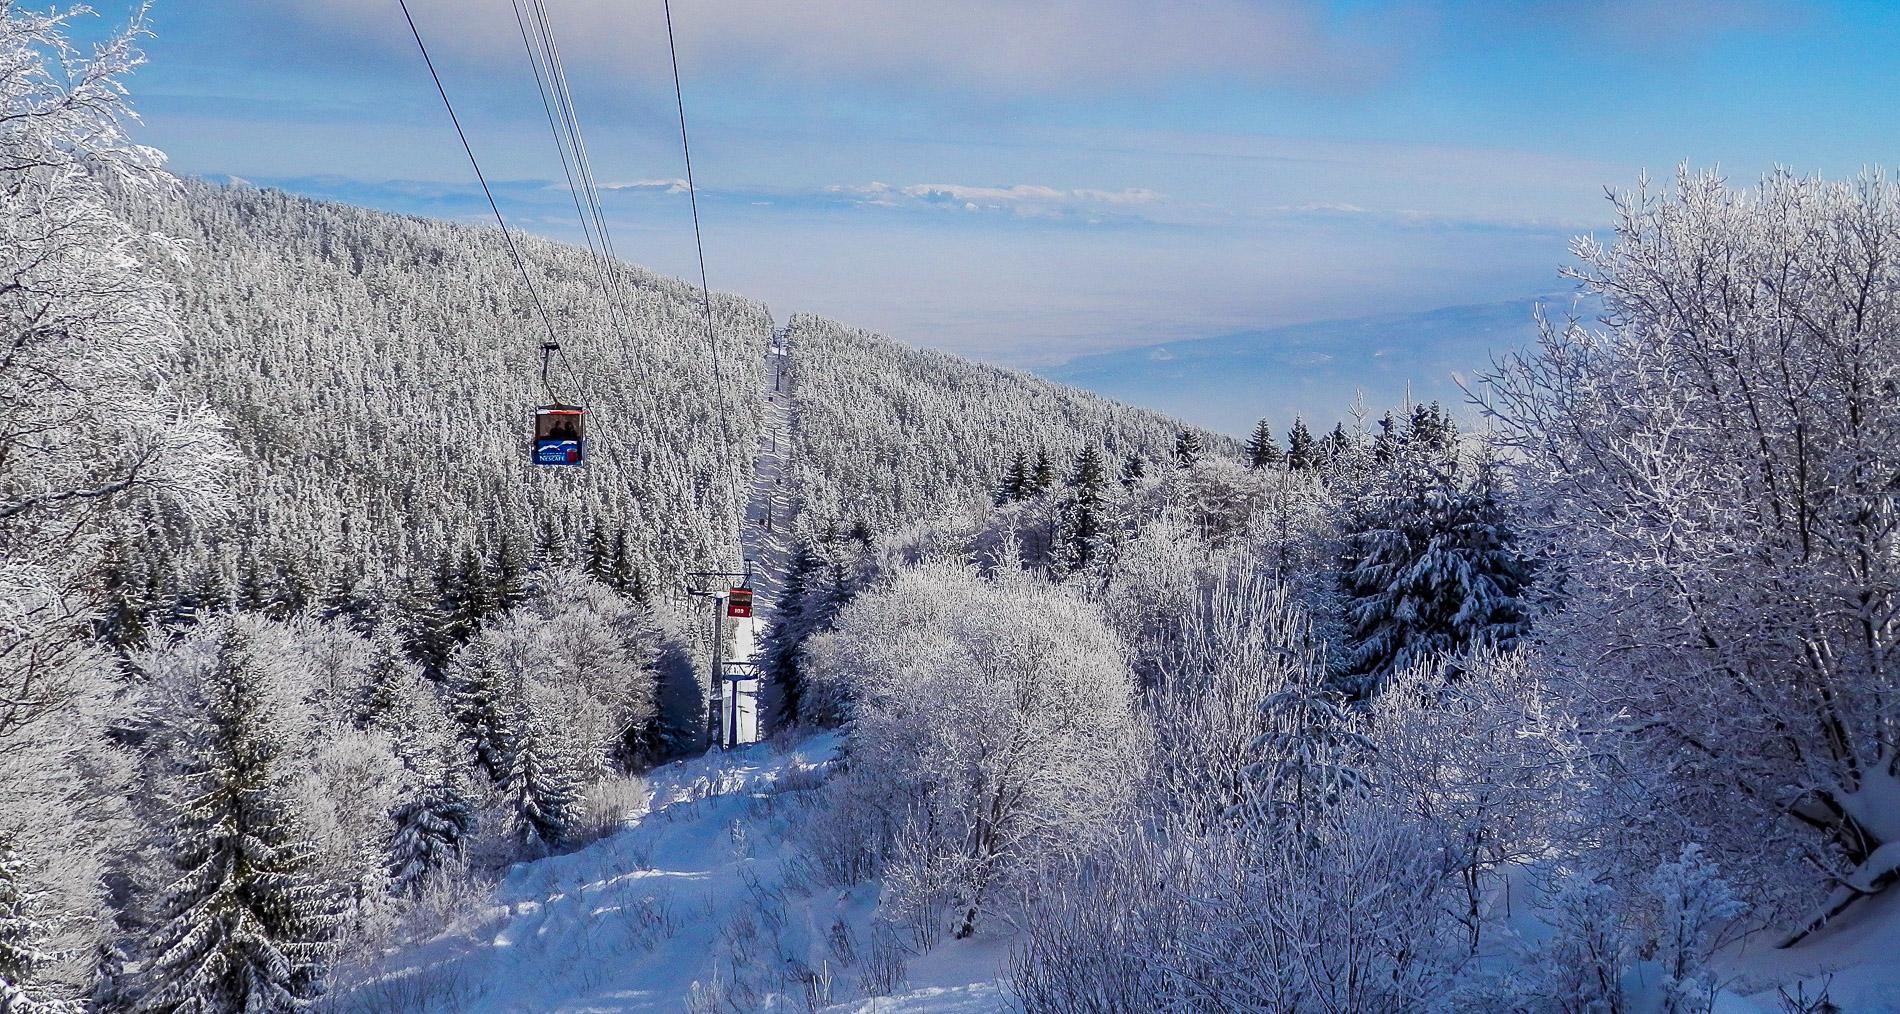 vito-valentinetti-100-days-of-winter-vitosha-10